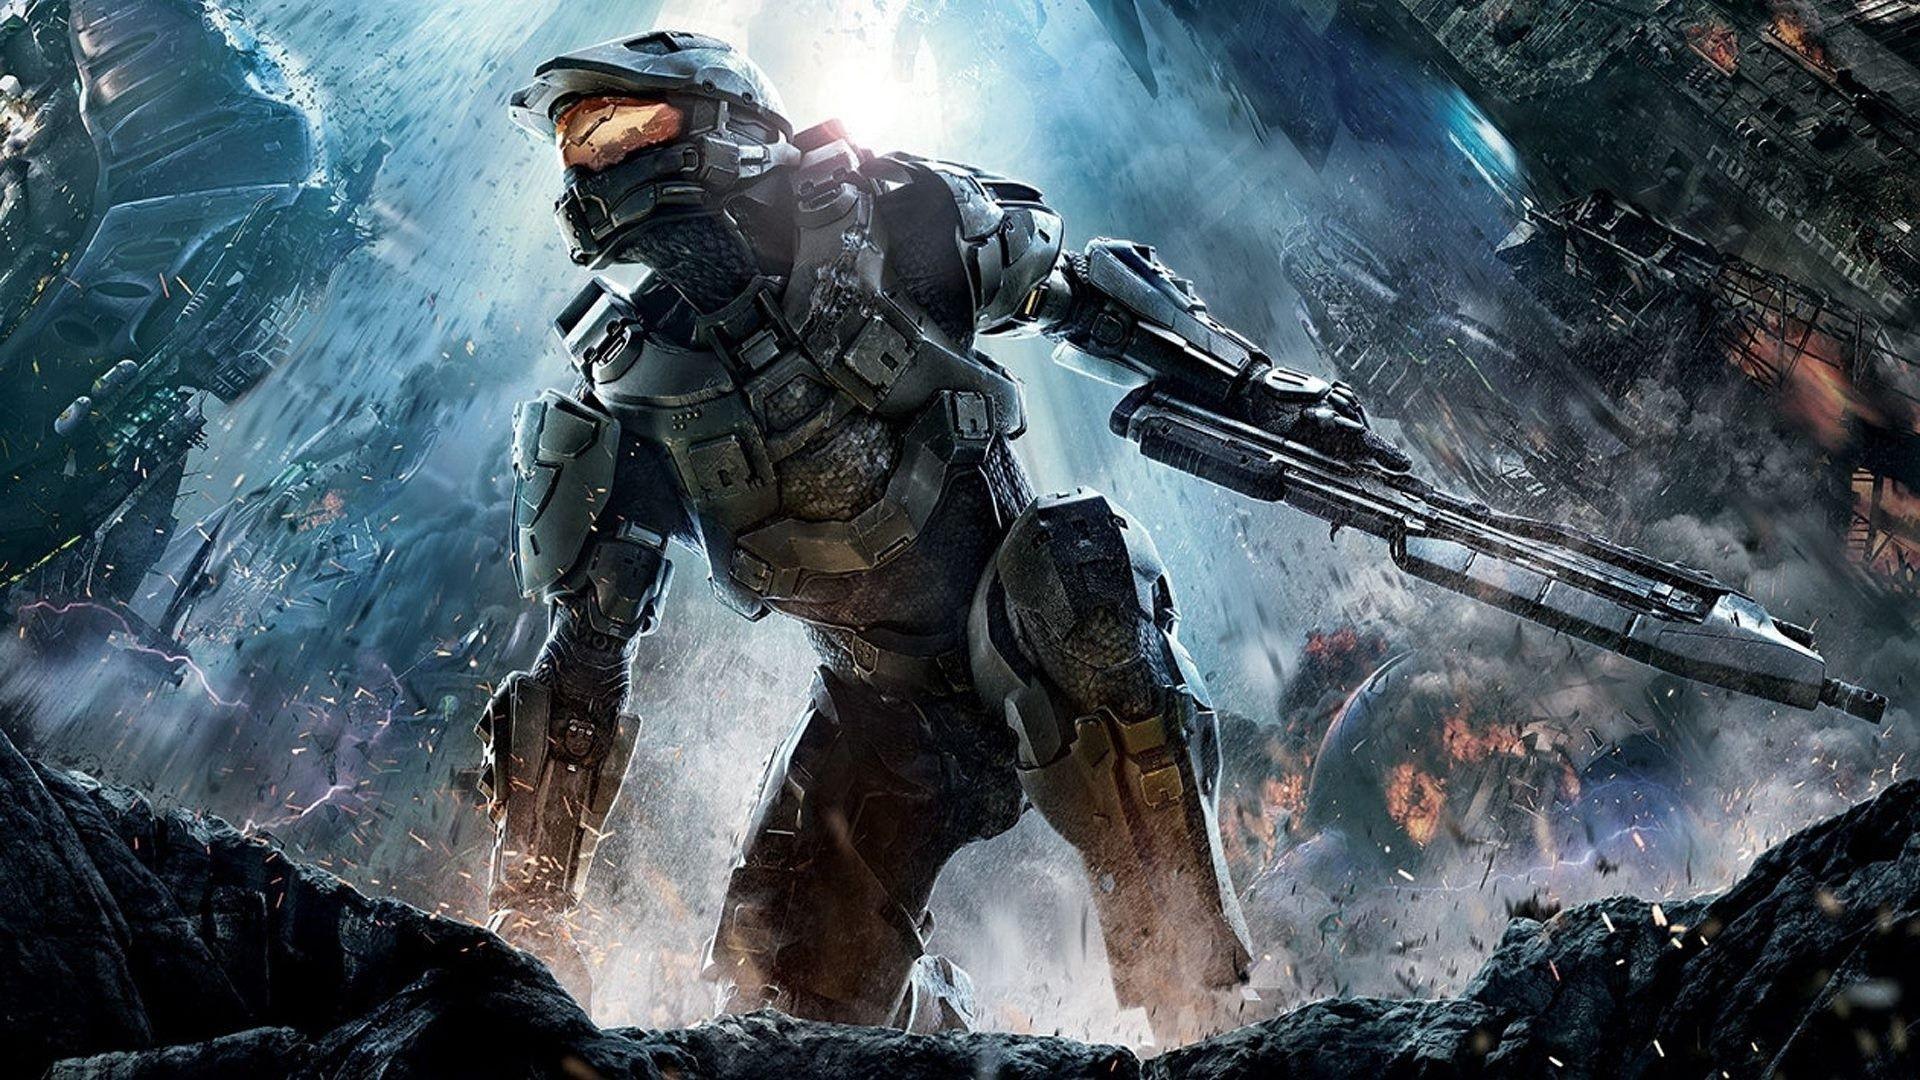 Halo 4 wallpaper hd wallpapertag - Halo 4 photos ...